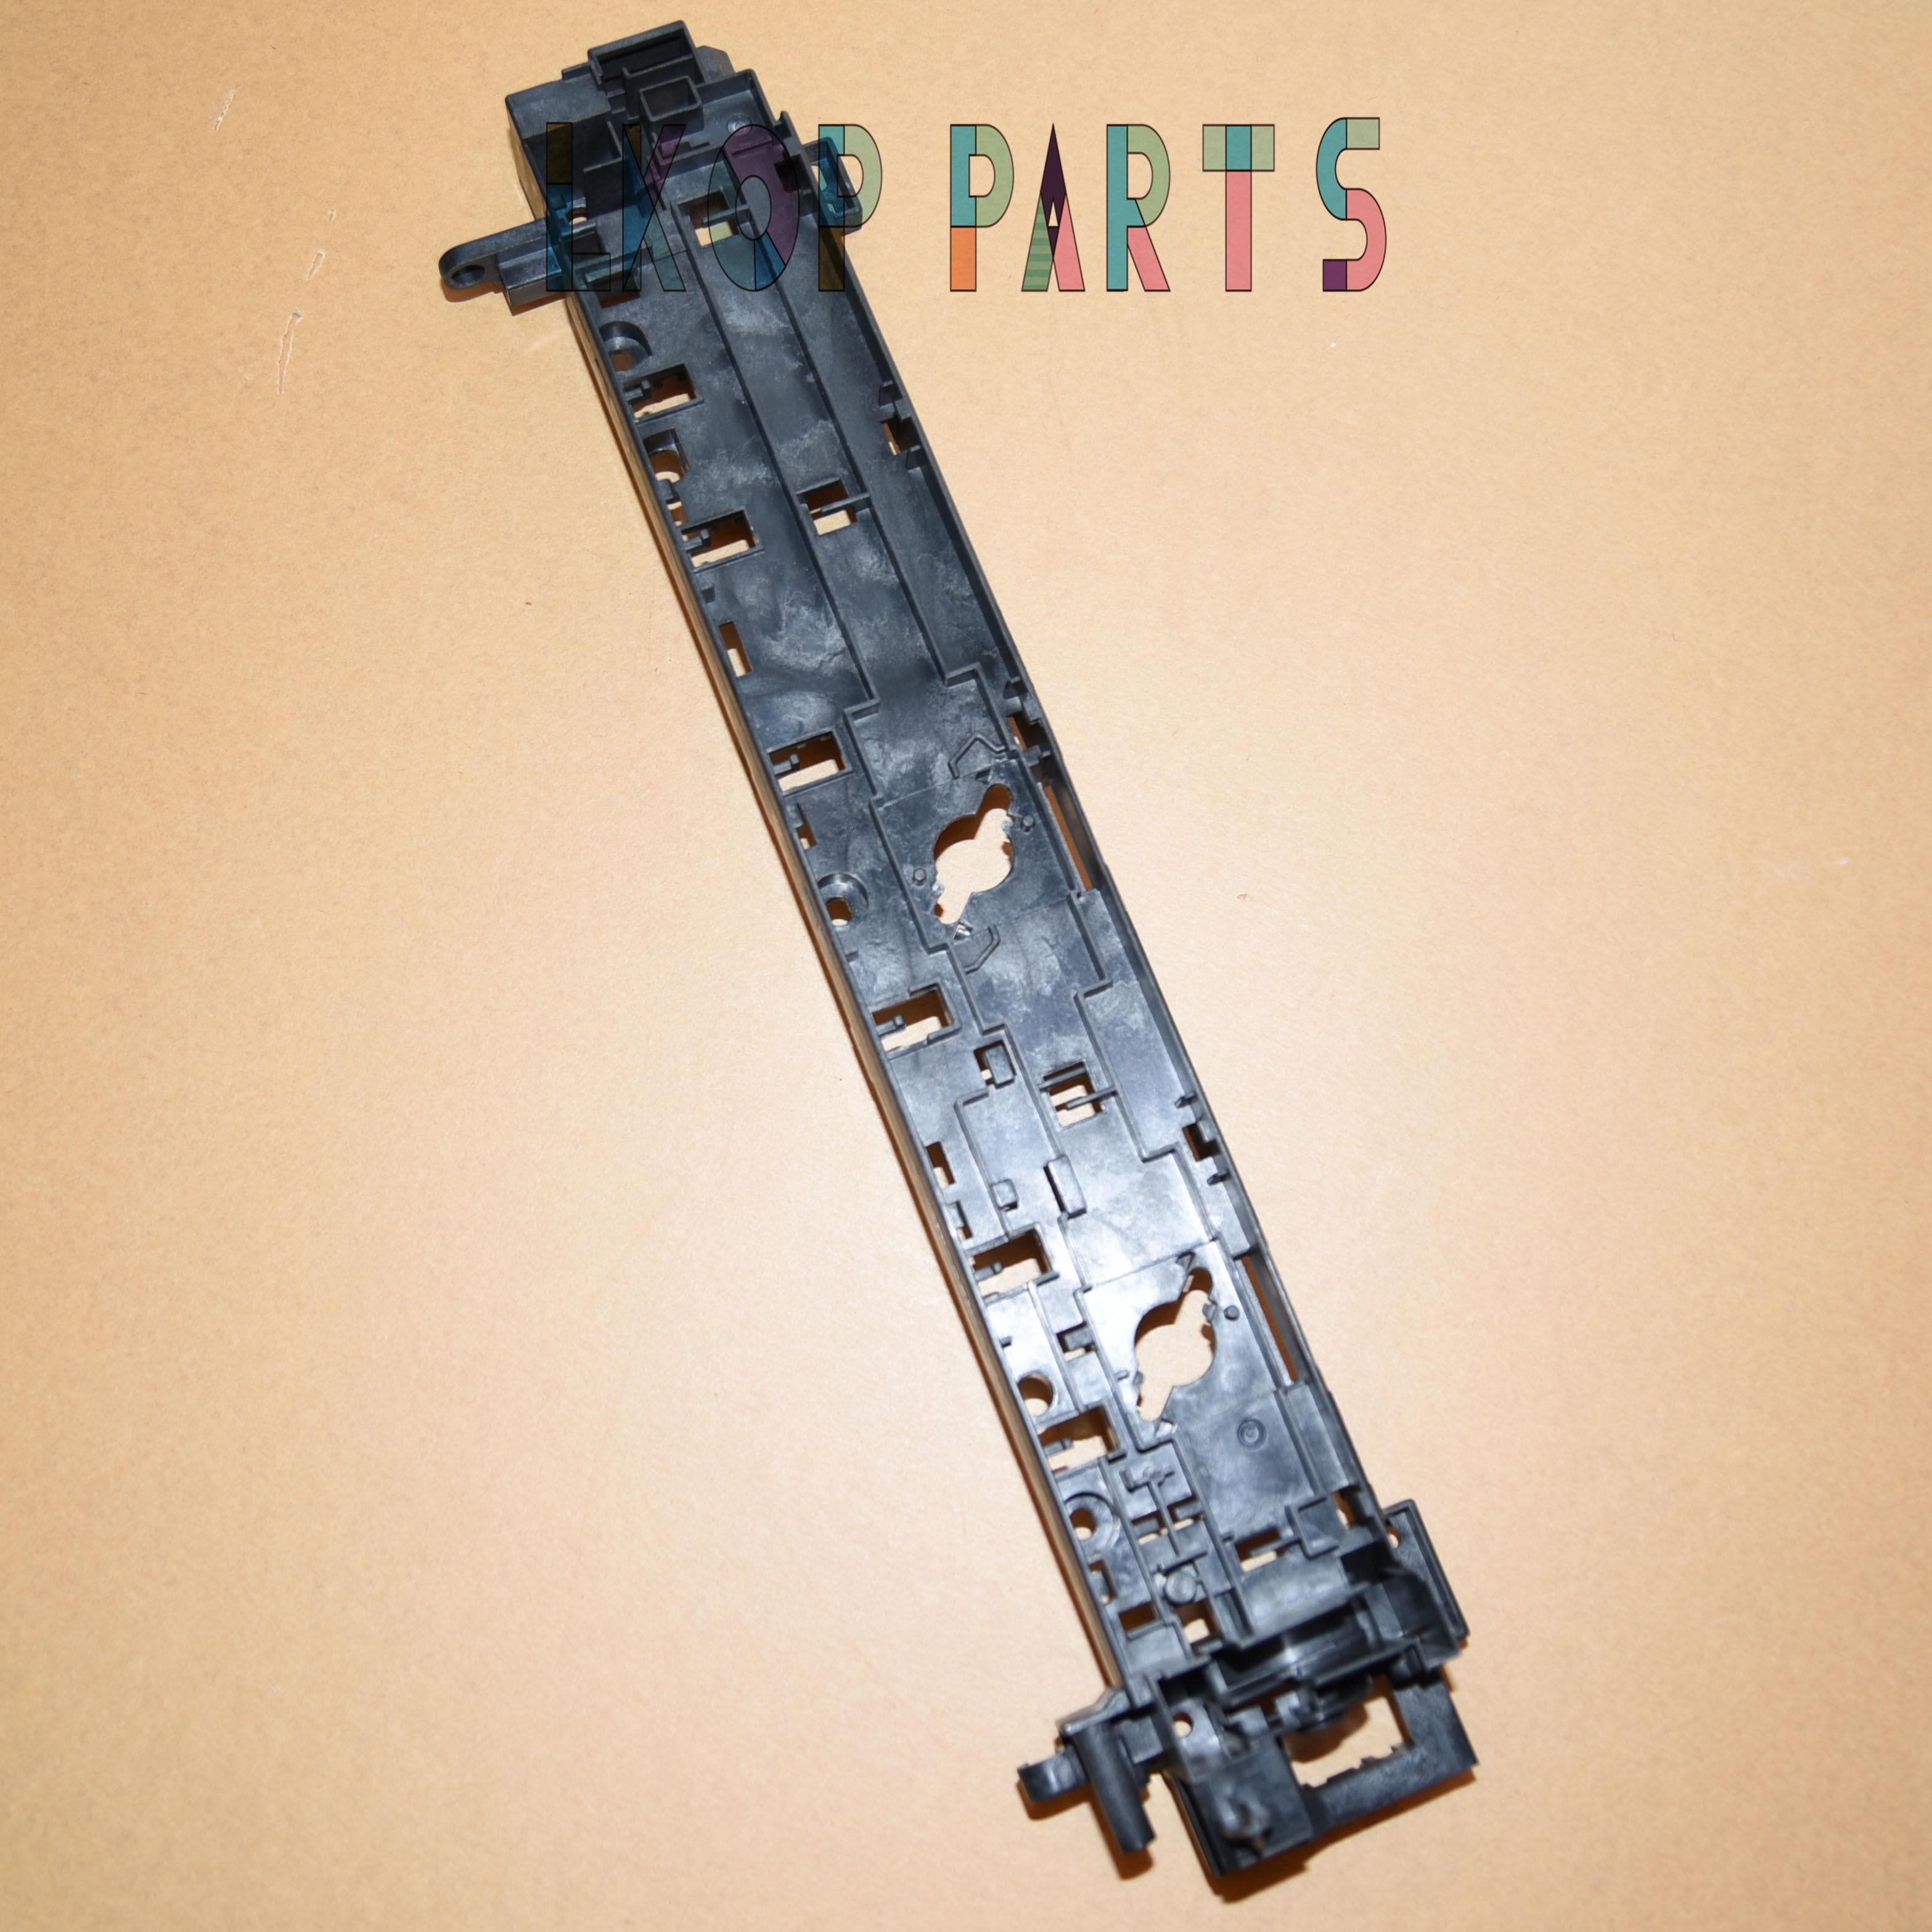 1 Uds FK-460 FK460 302KK93041 para kyocera TASKalfa 180 181 220 221 marco fusor selector dedo soporte separación garra soporte